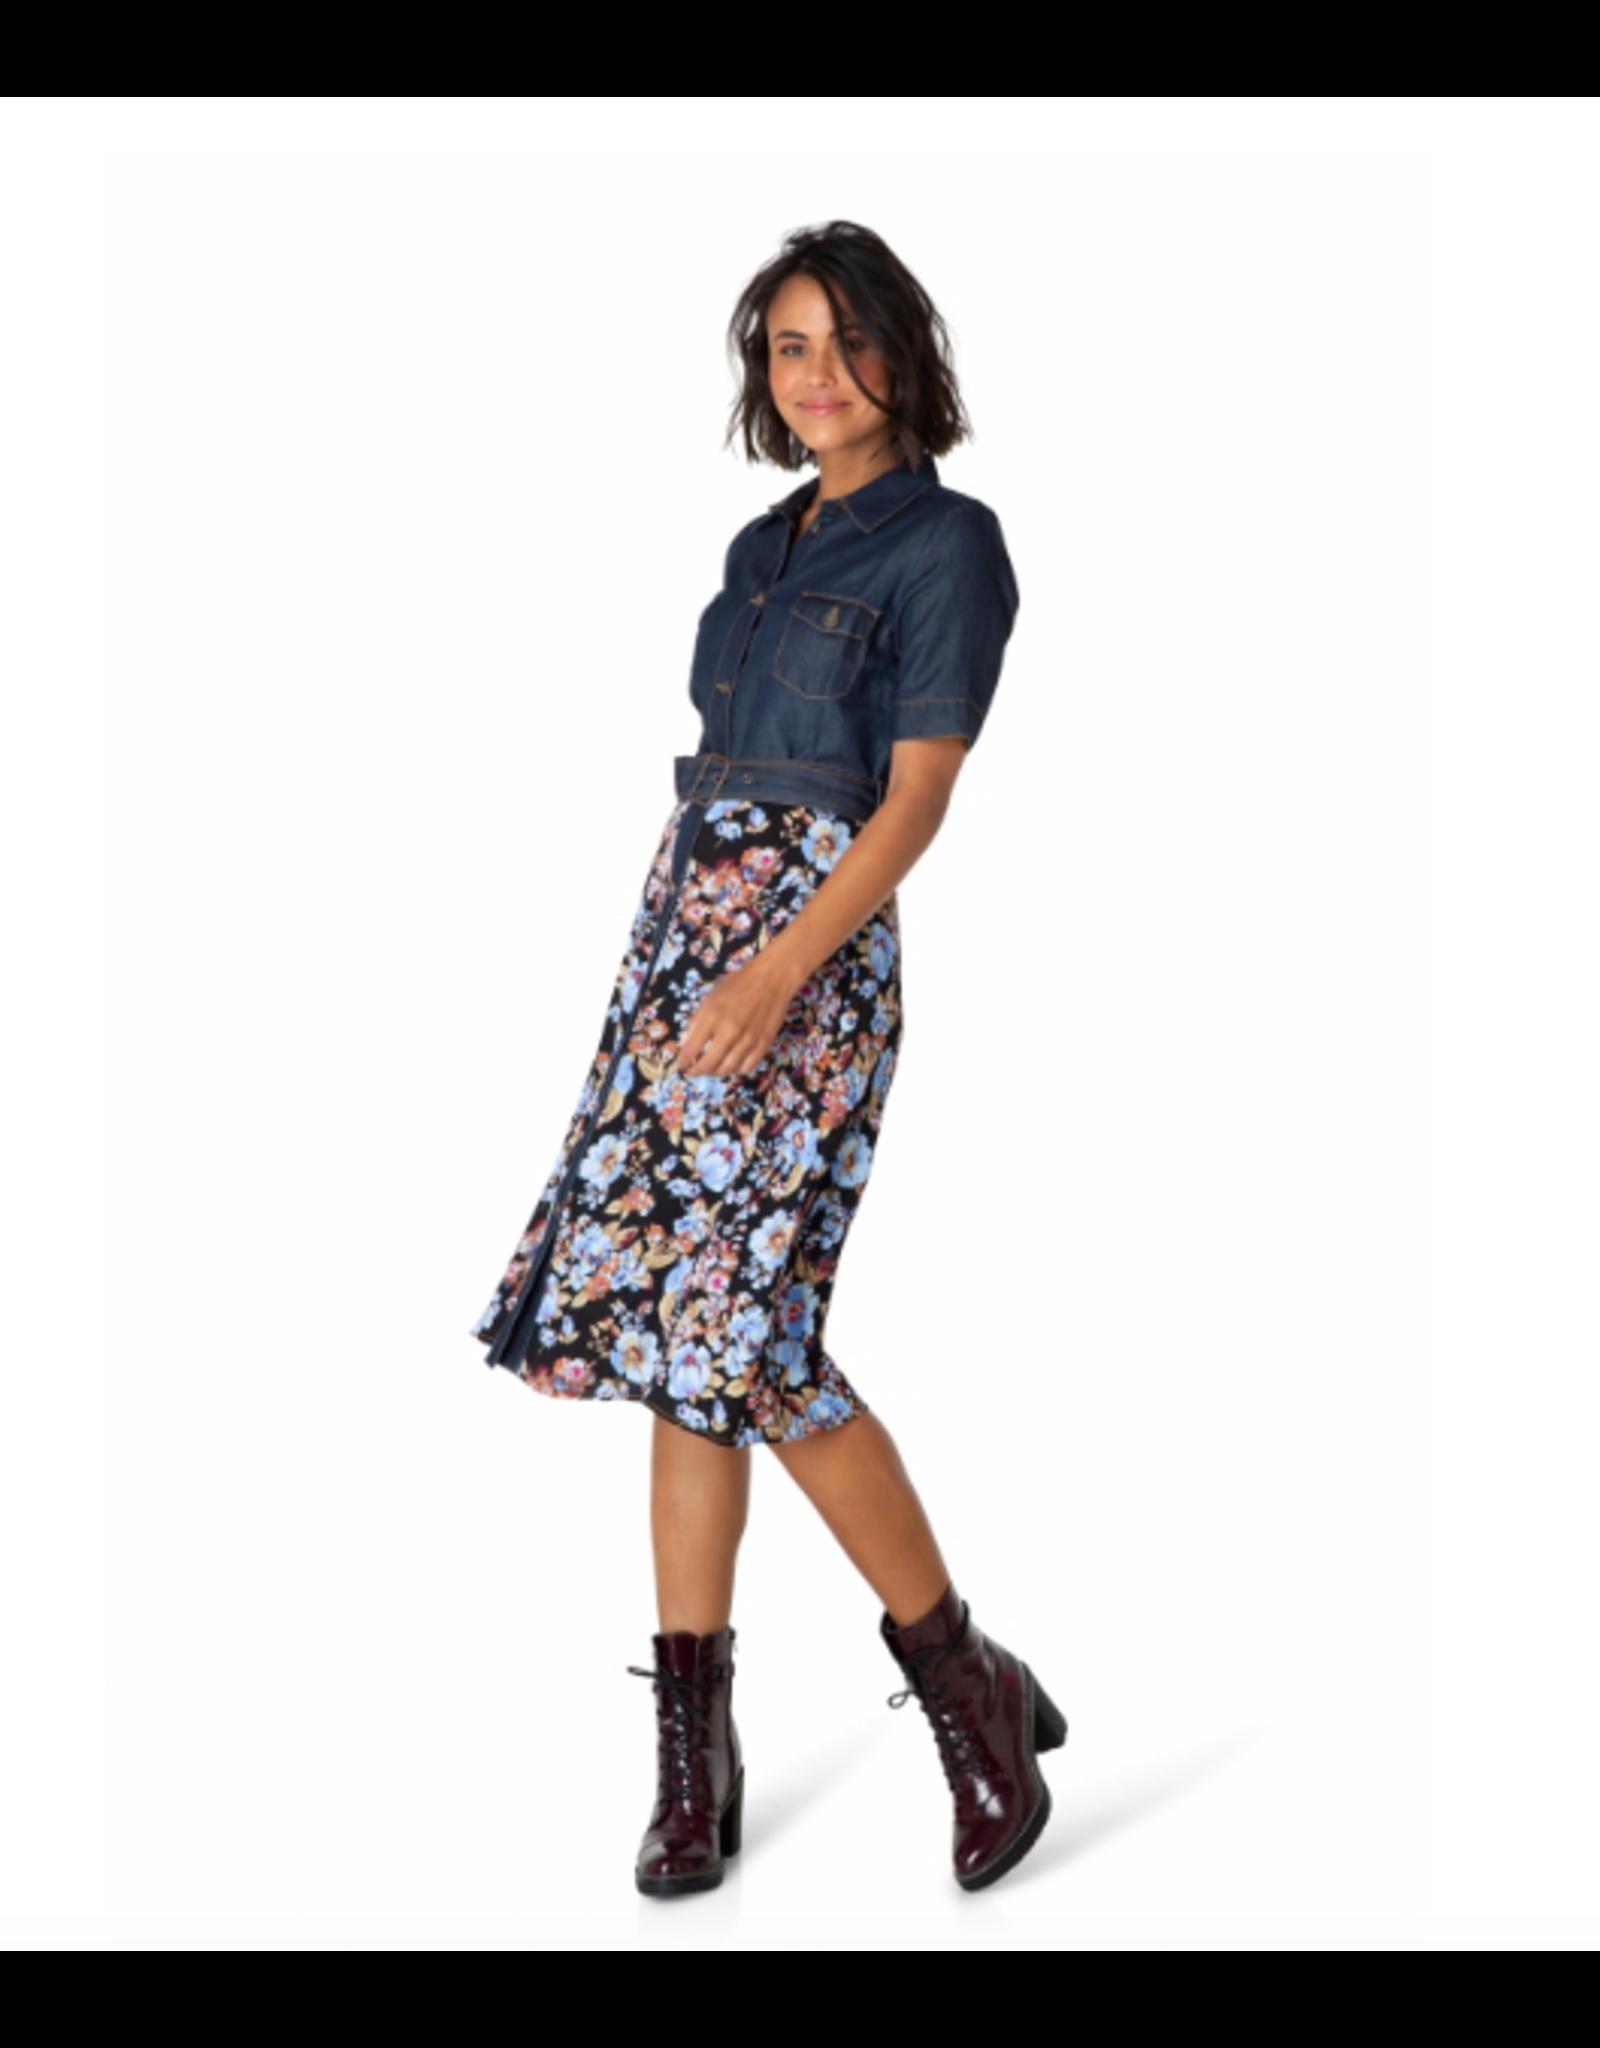 Yest Yest - Olivia denim and floral dress